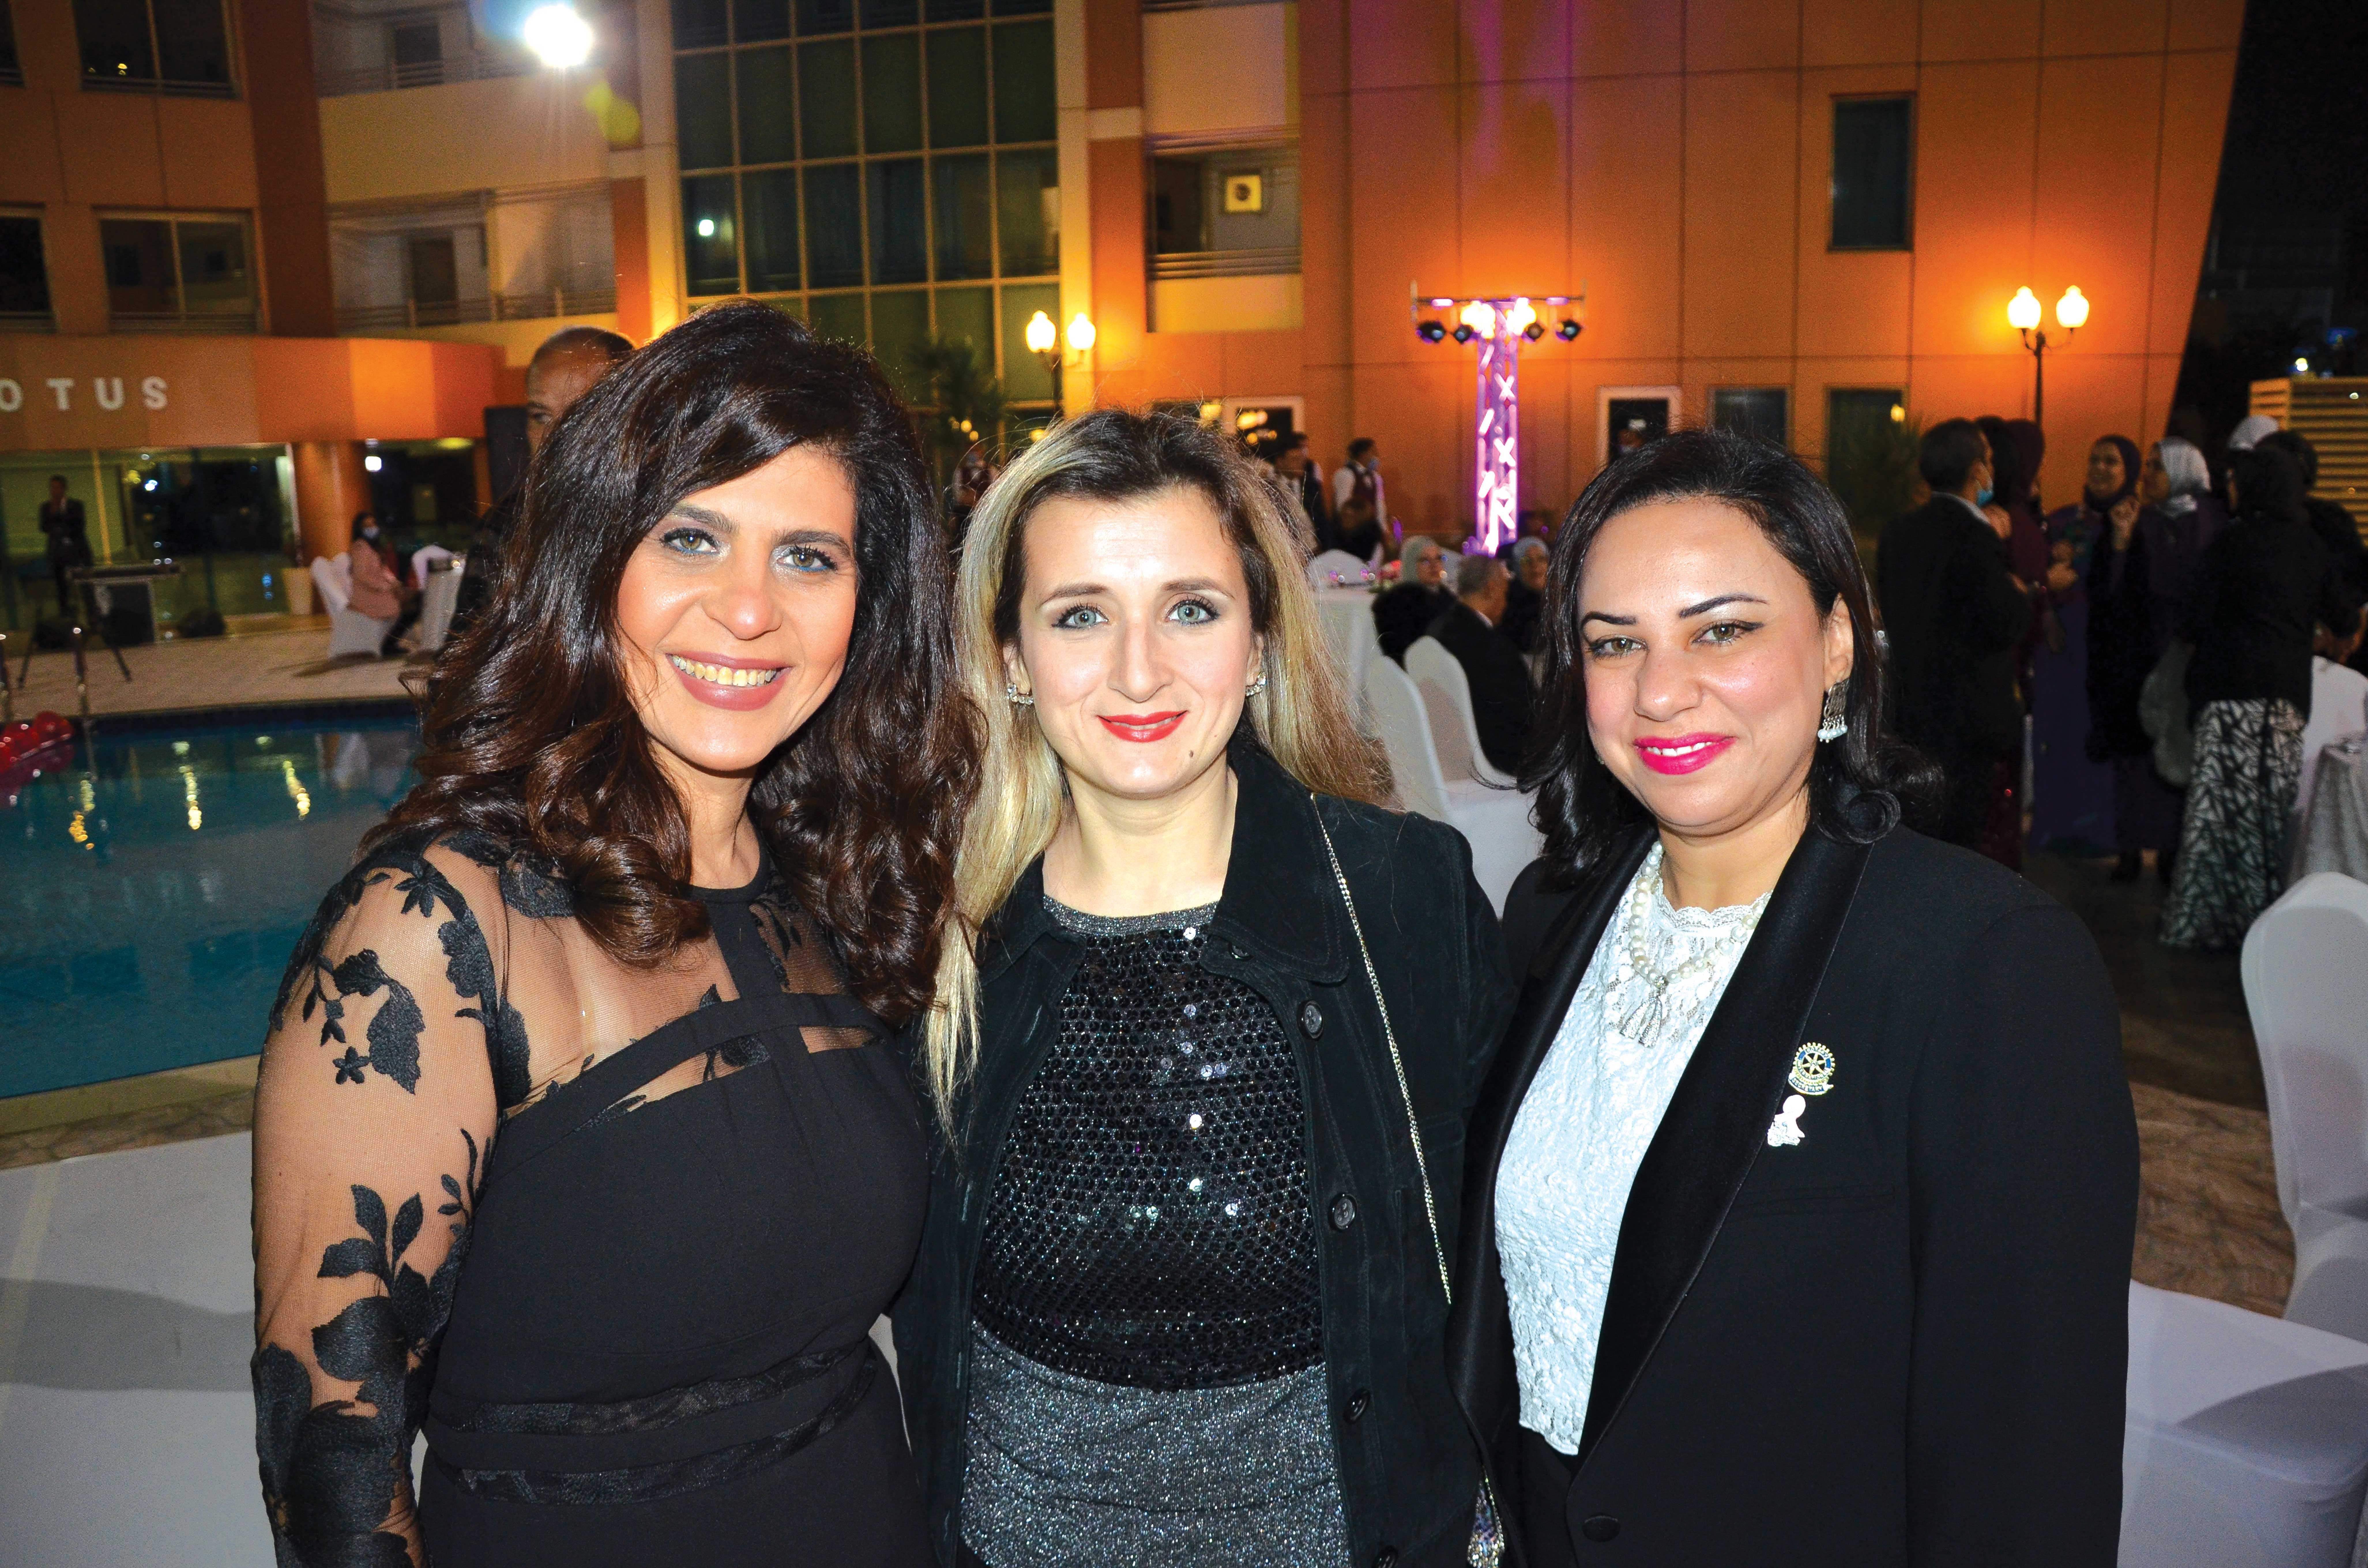 Ms. Manal Abuzeid, Ms. Gofrand Kayali & Ms. Safaa Shihata